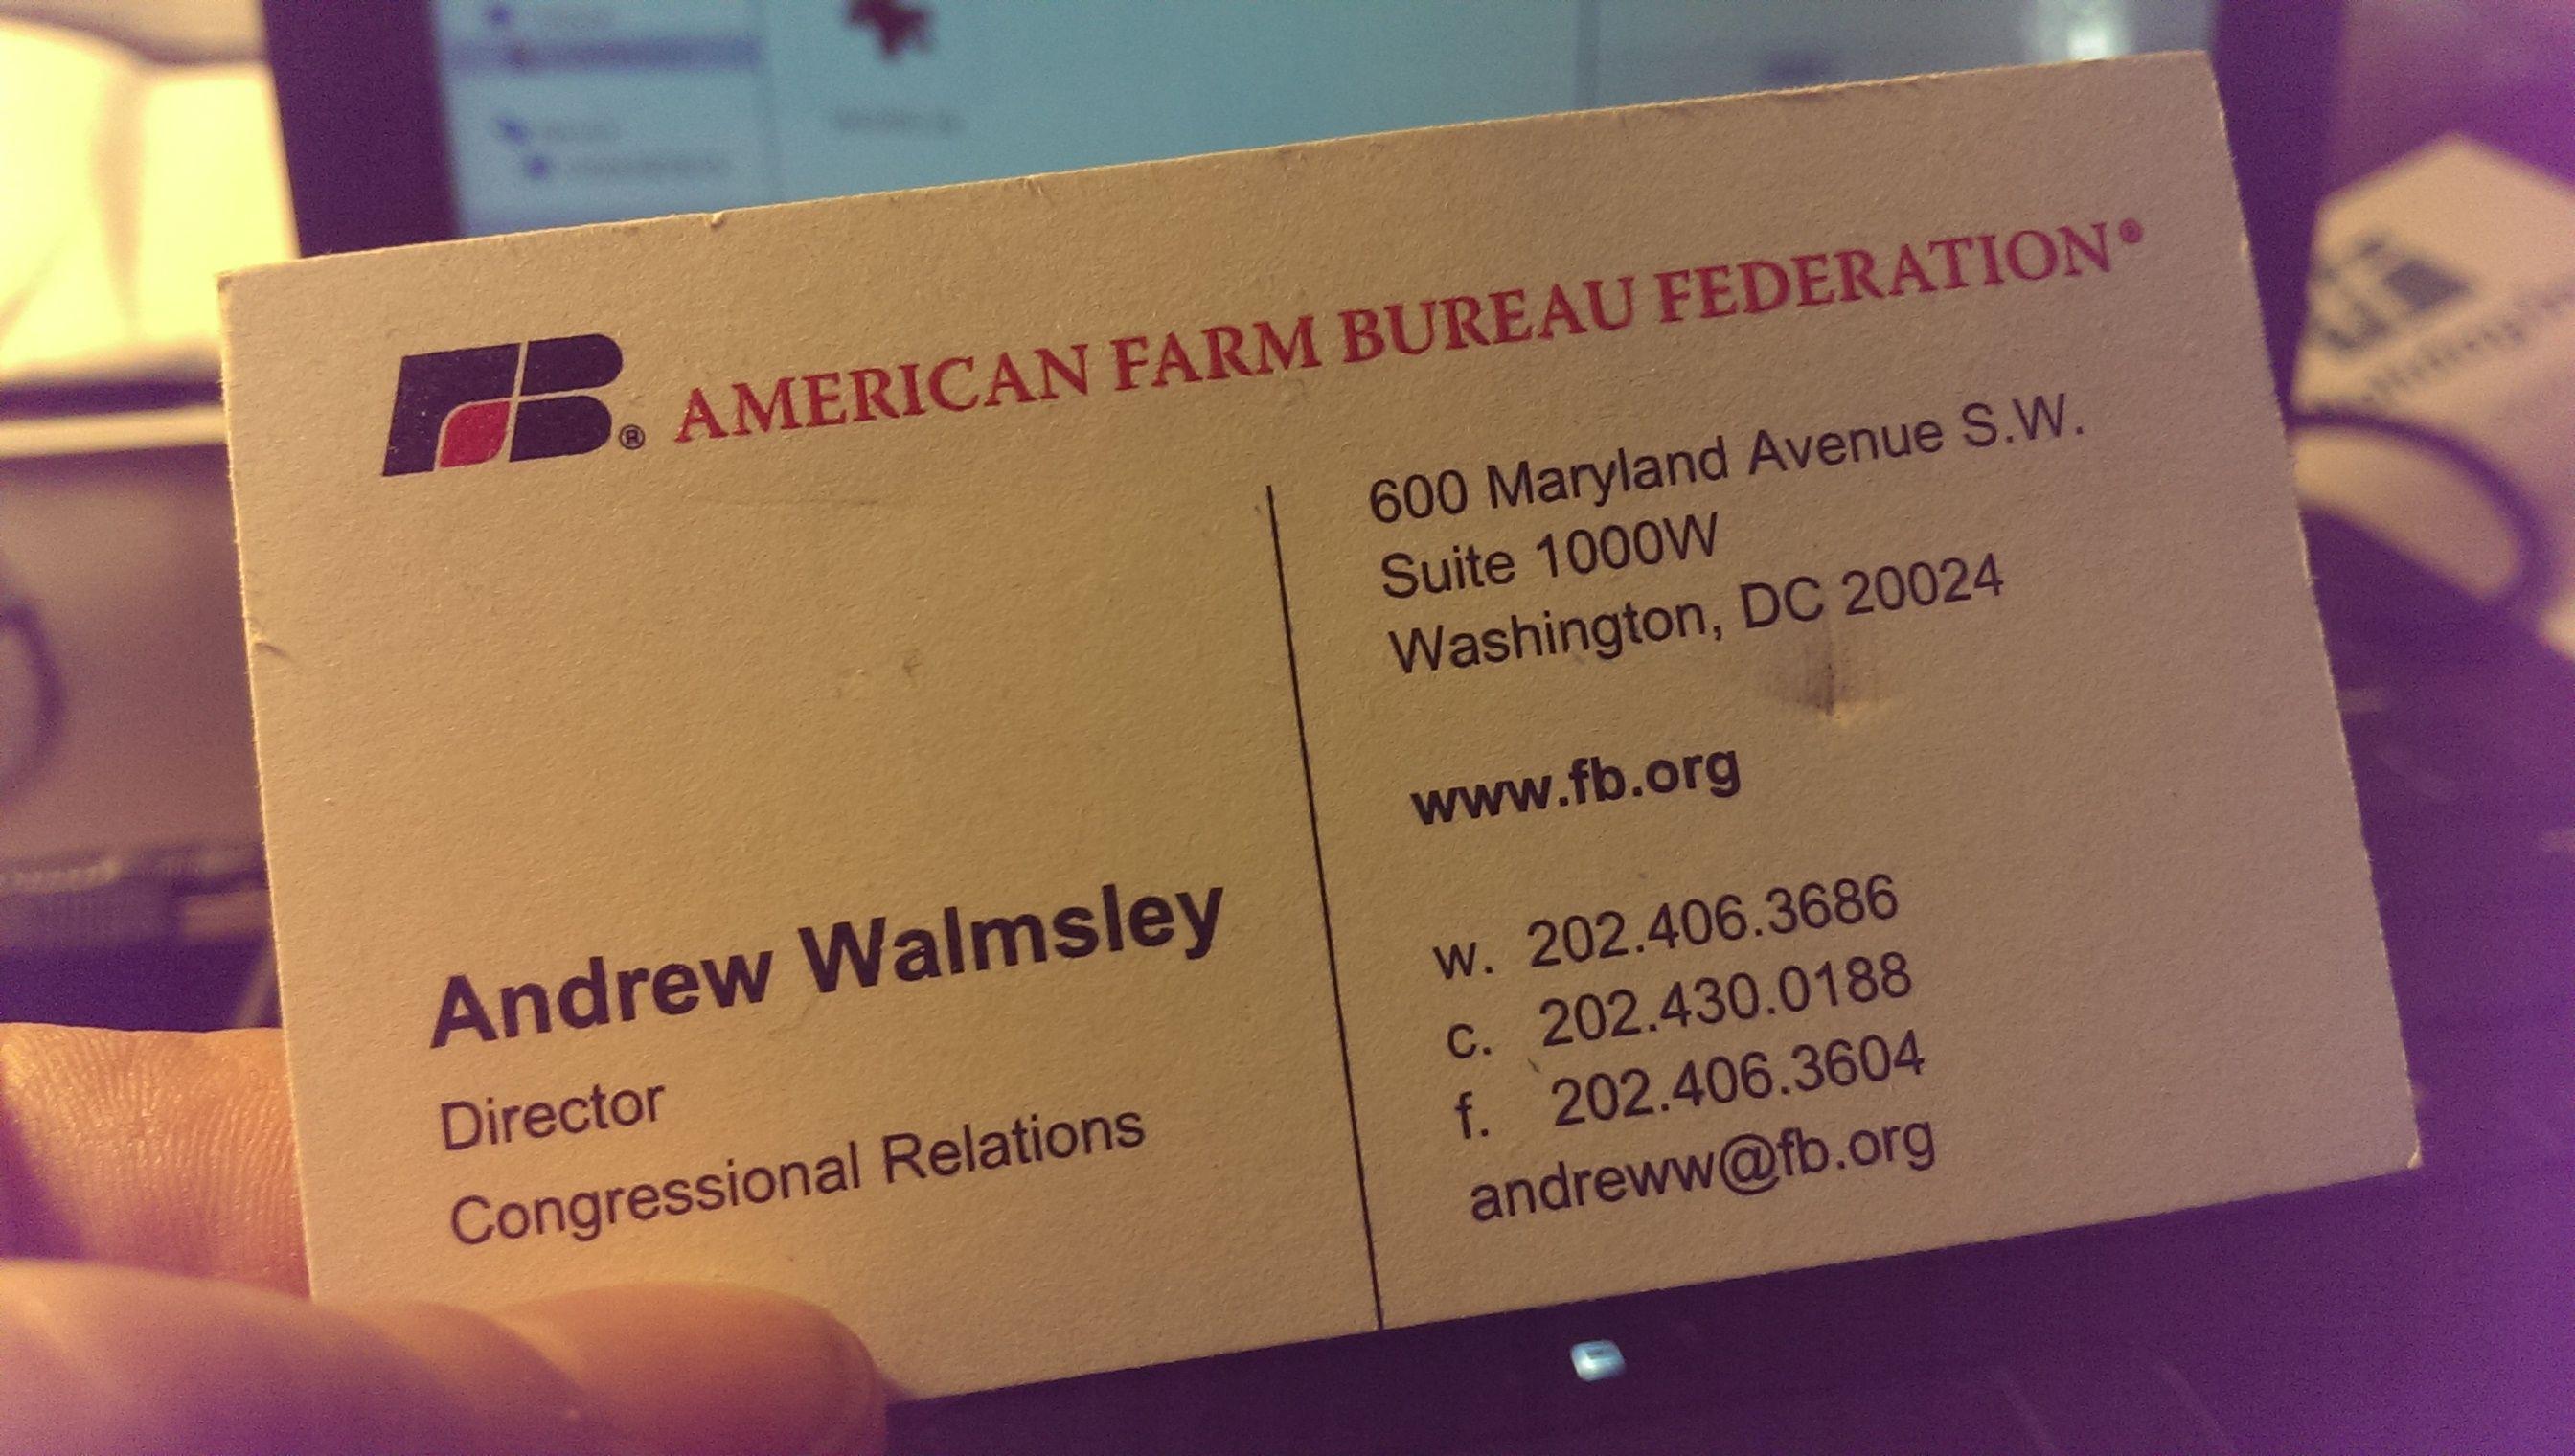 Andrew Waimsley Business Card Farm Bureau In Washington